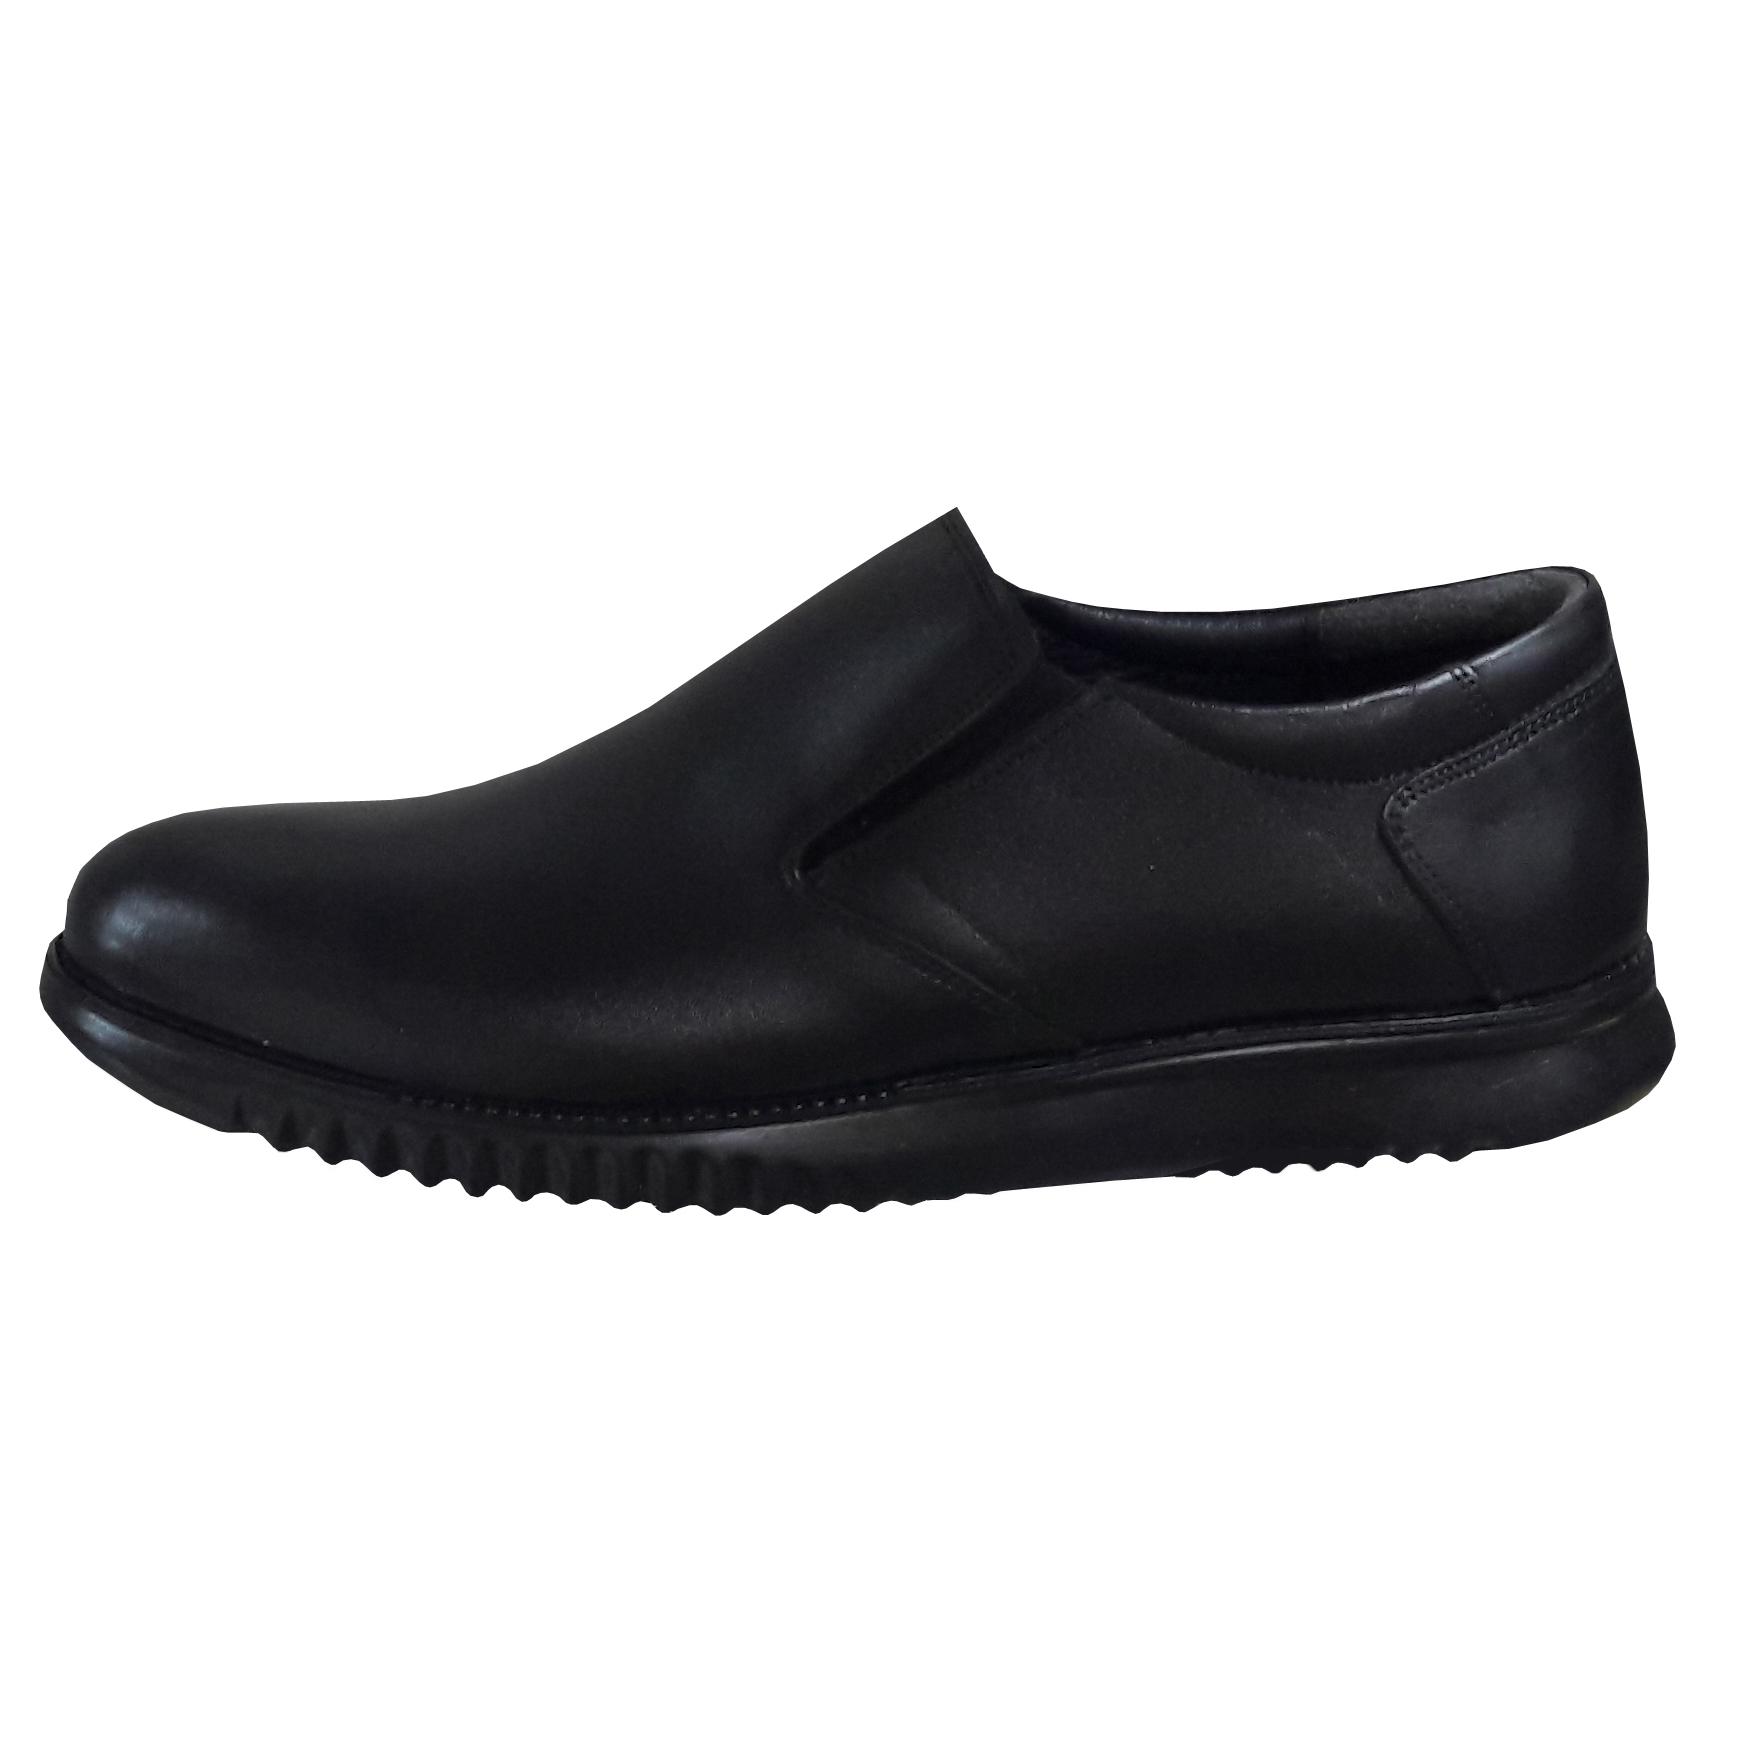 کفش روزمره مردانه آفاق مدل 505090